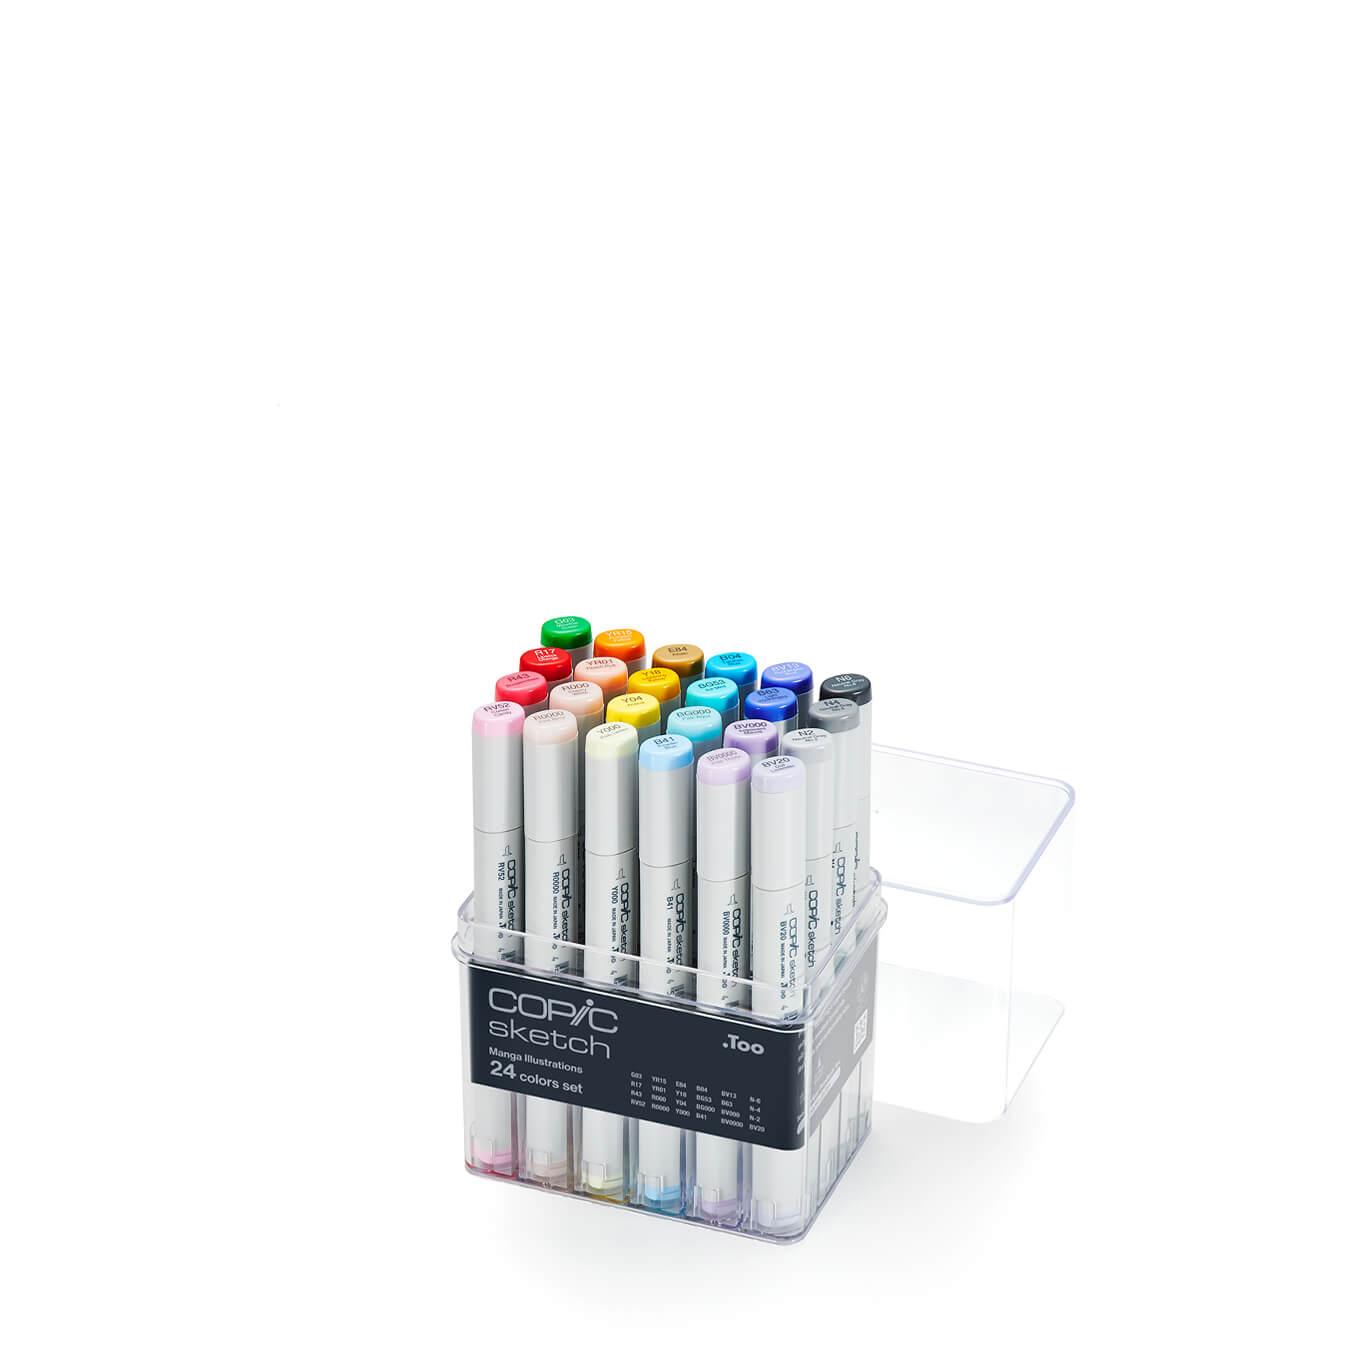 Copic Sketch 24 colors set for Manga Illustrations